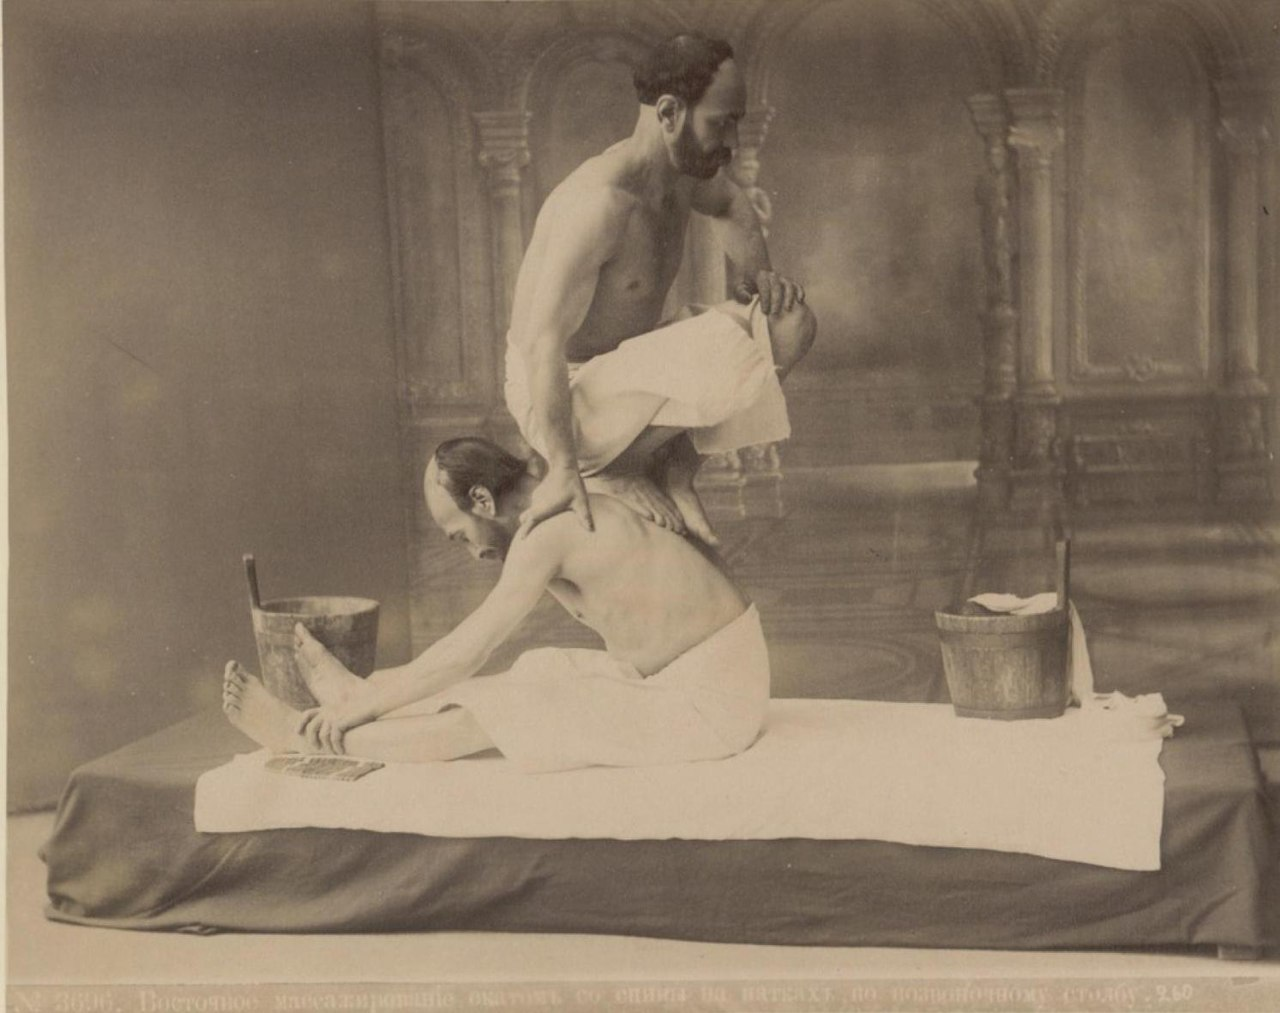 File:Yermakov. The Oriental bath. Massage. 1880.jpg - Wikipedia